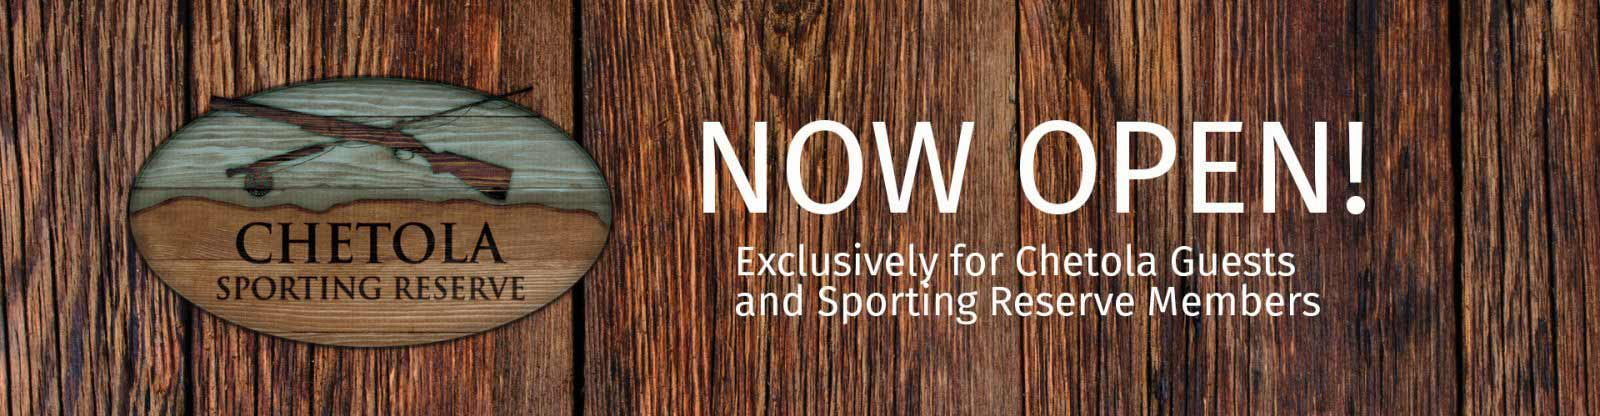 chetola sporting reserve